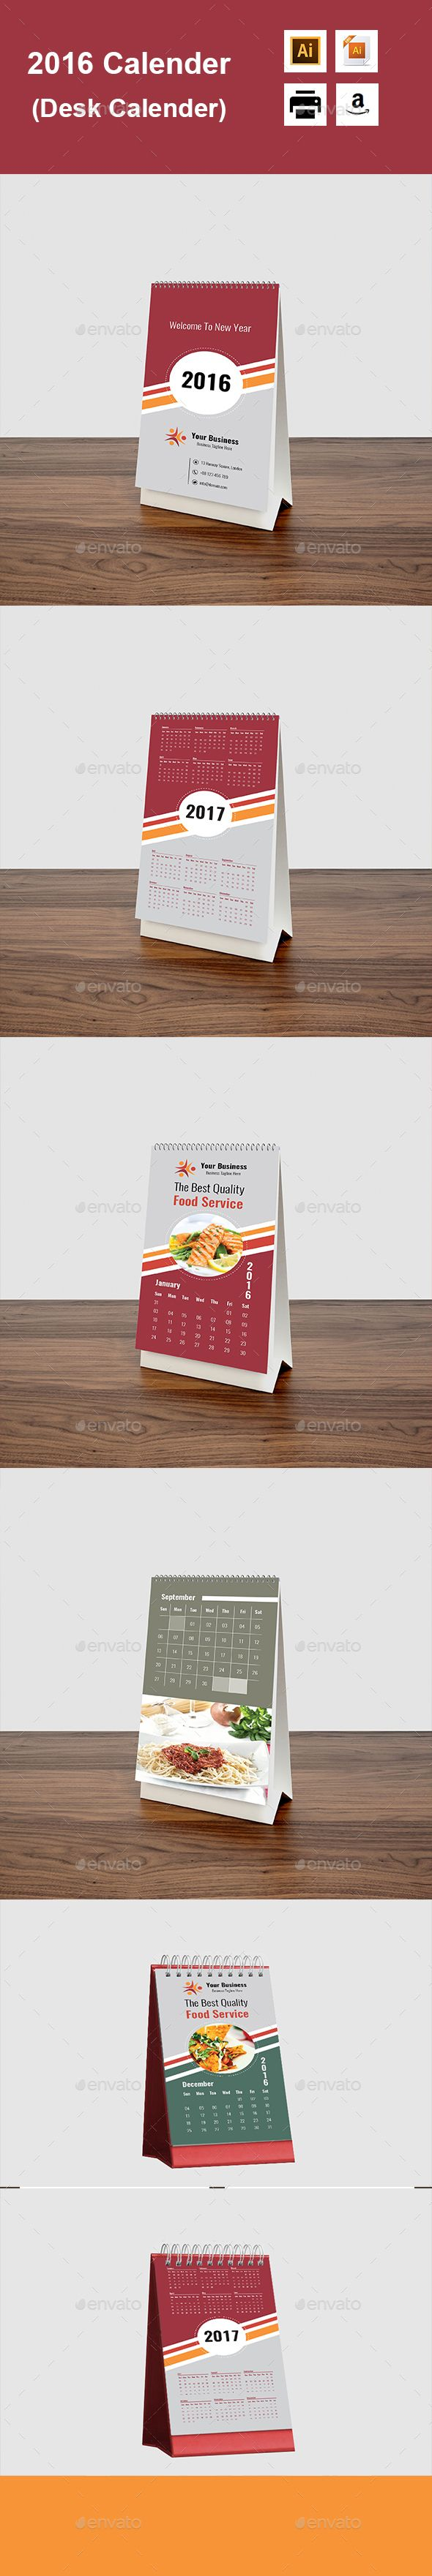 2016 Calender (Desk Calender) - Calendars Stationery